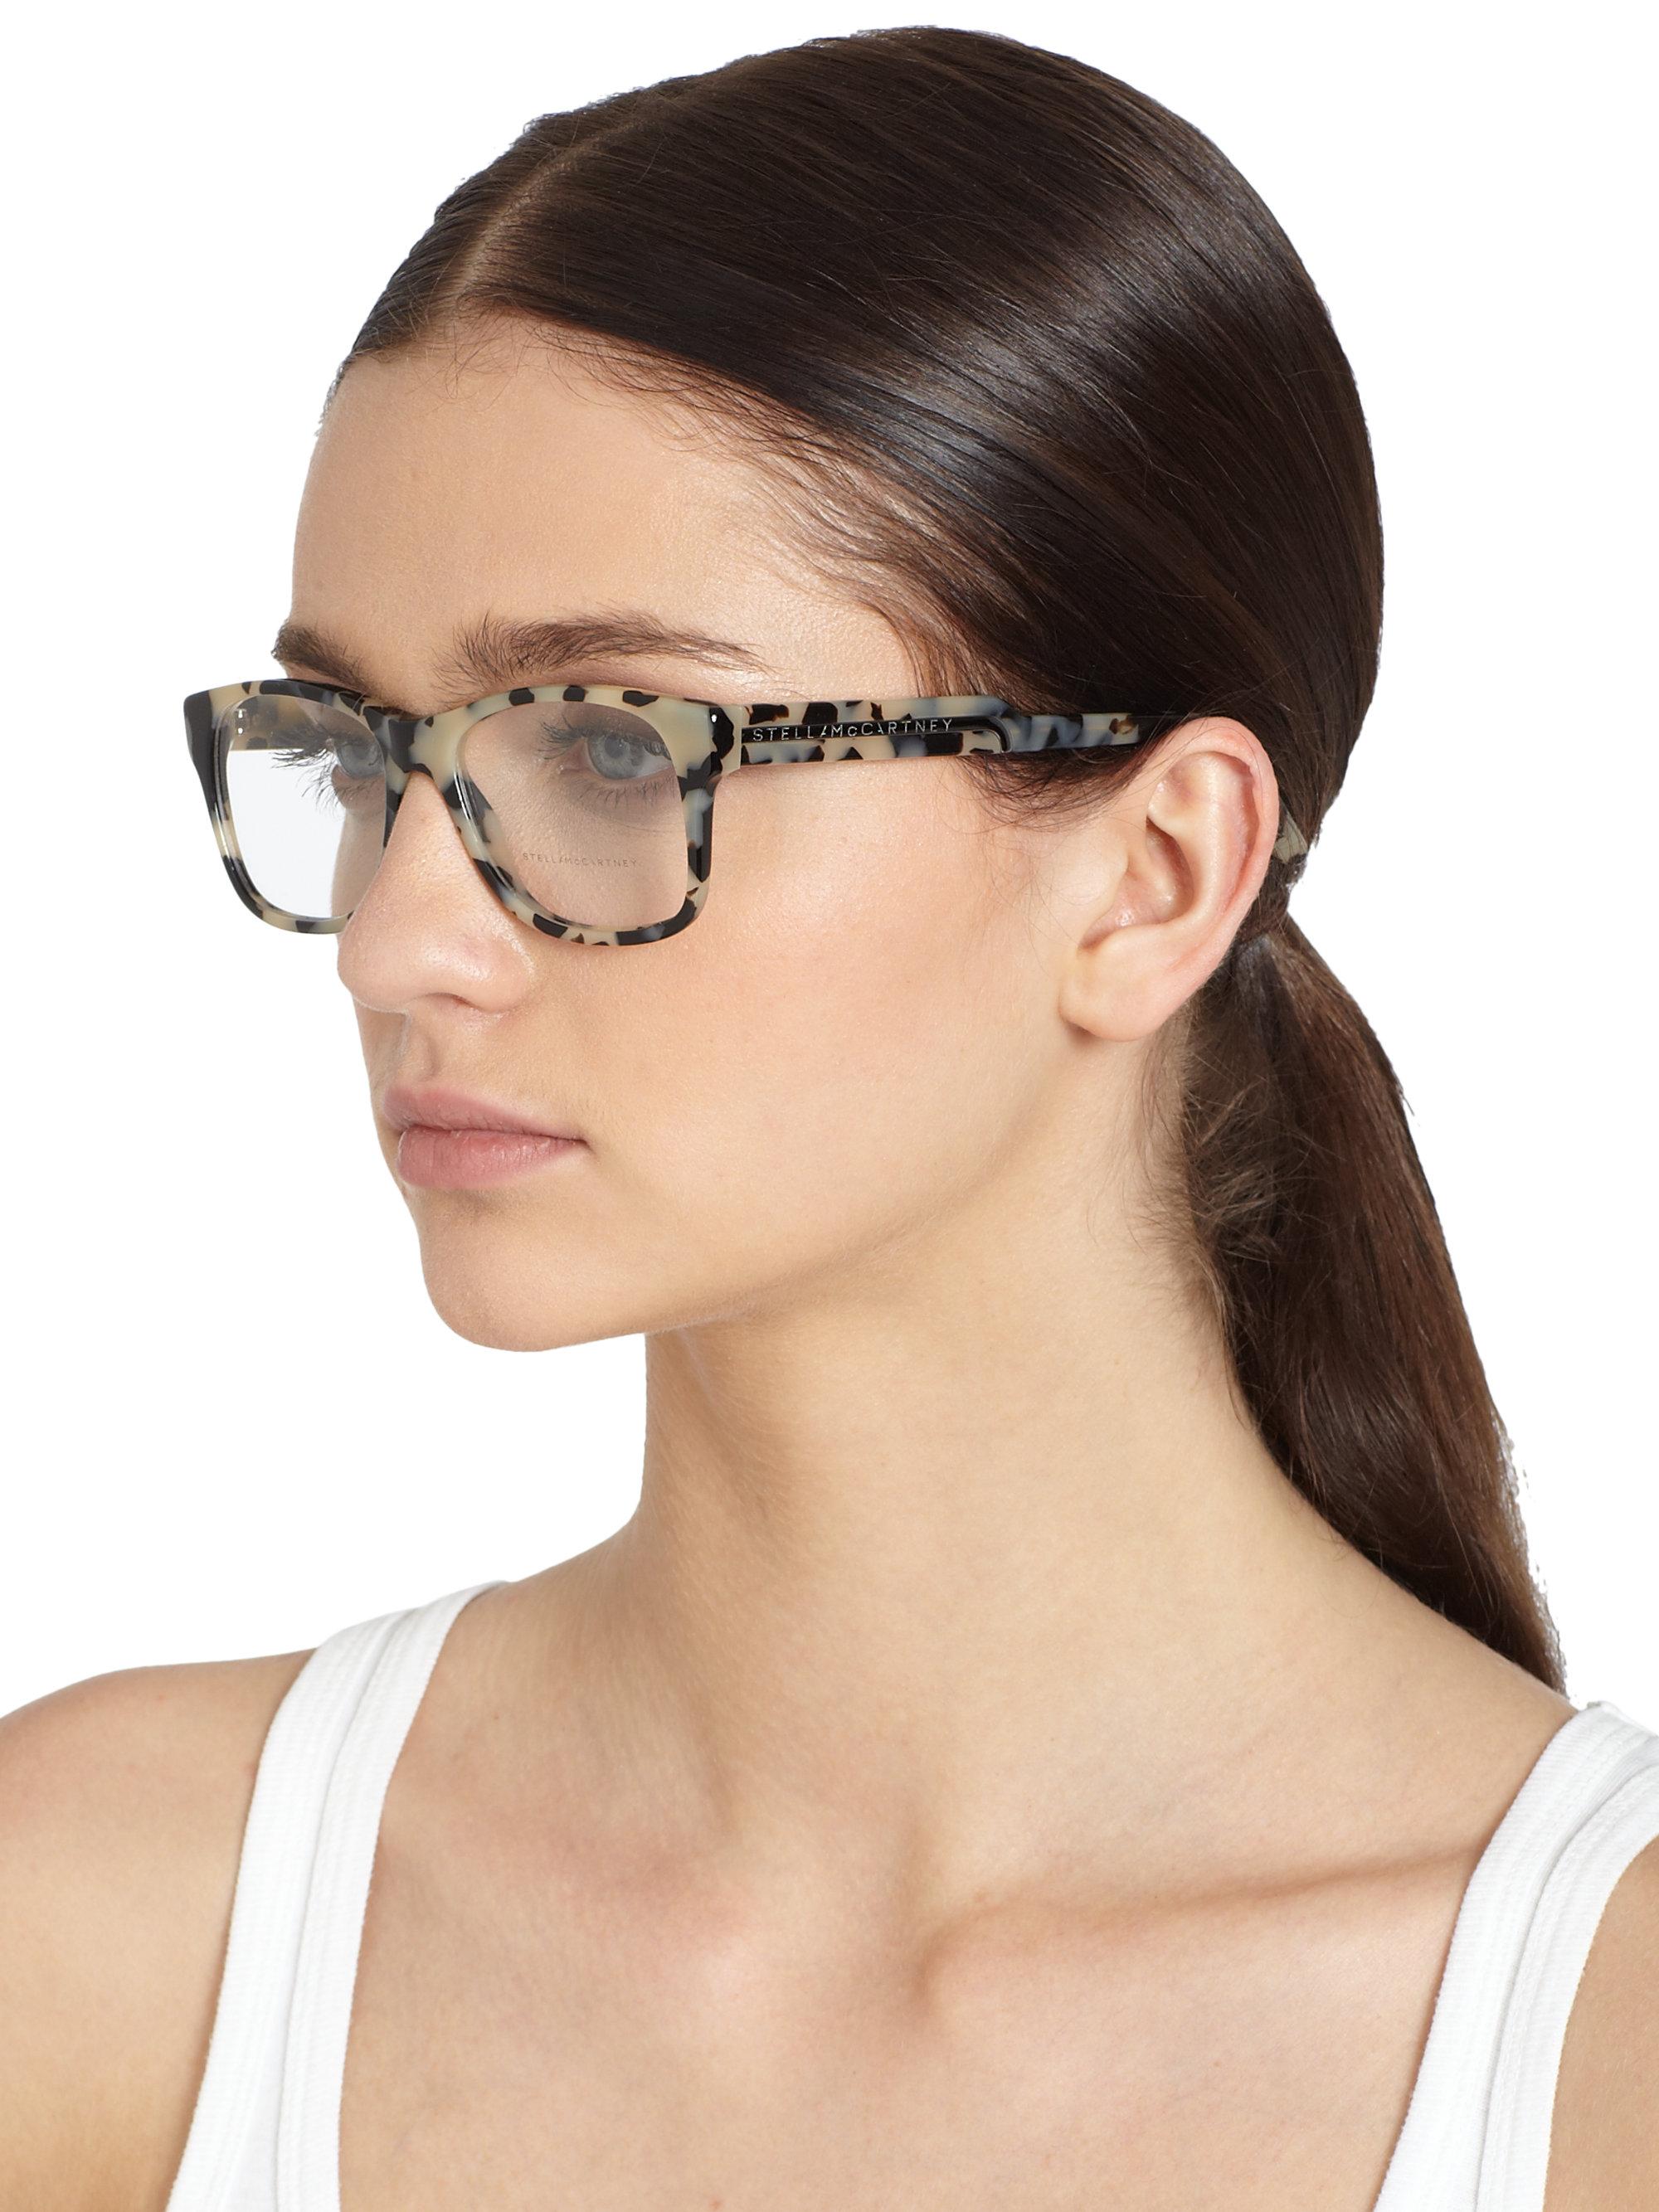 36eaec14b43db Stella McCartney Oversized Square Optical Glasses grey Tortoise ...